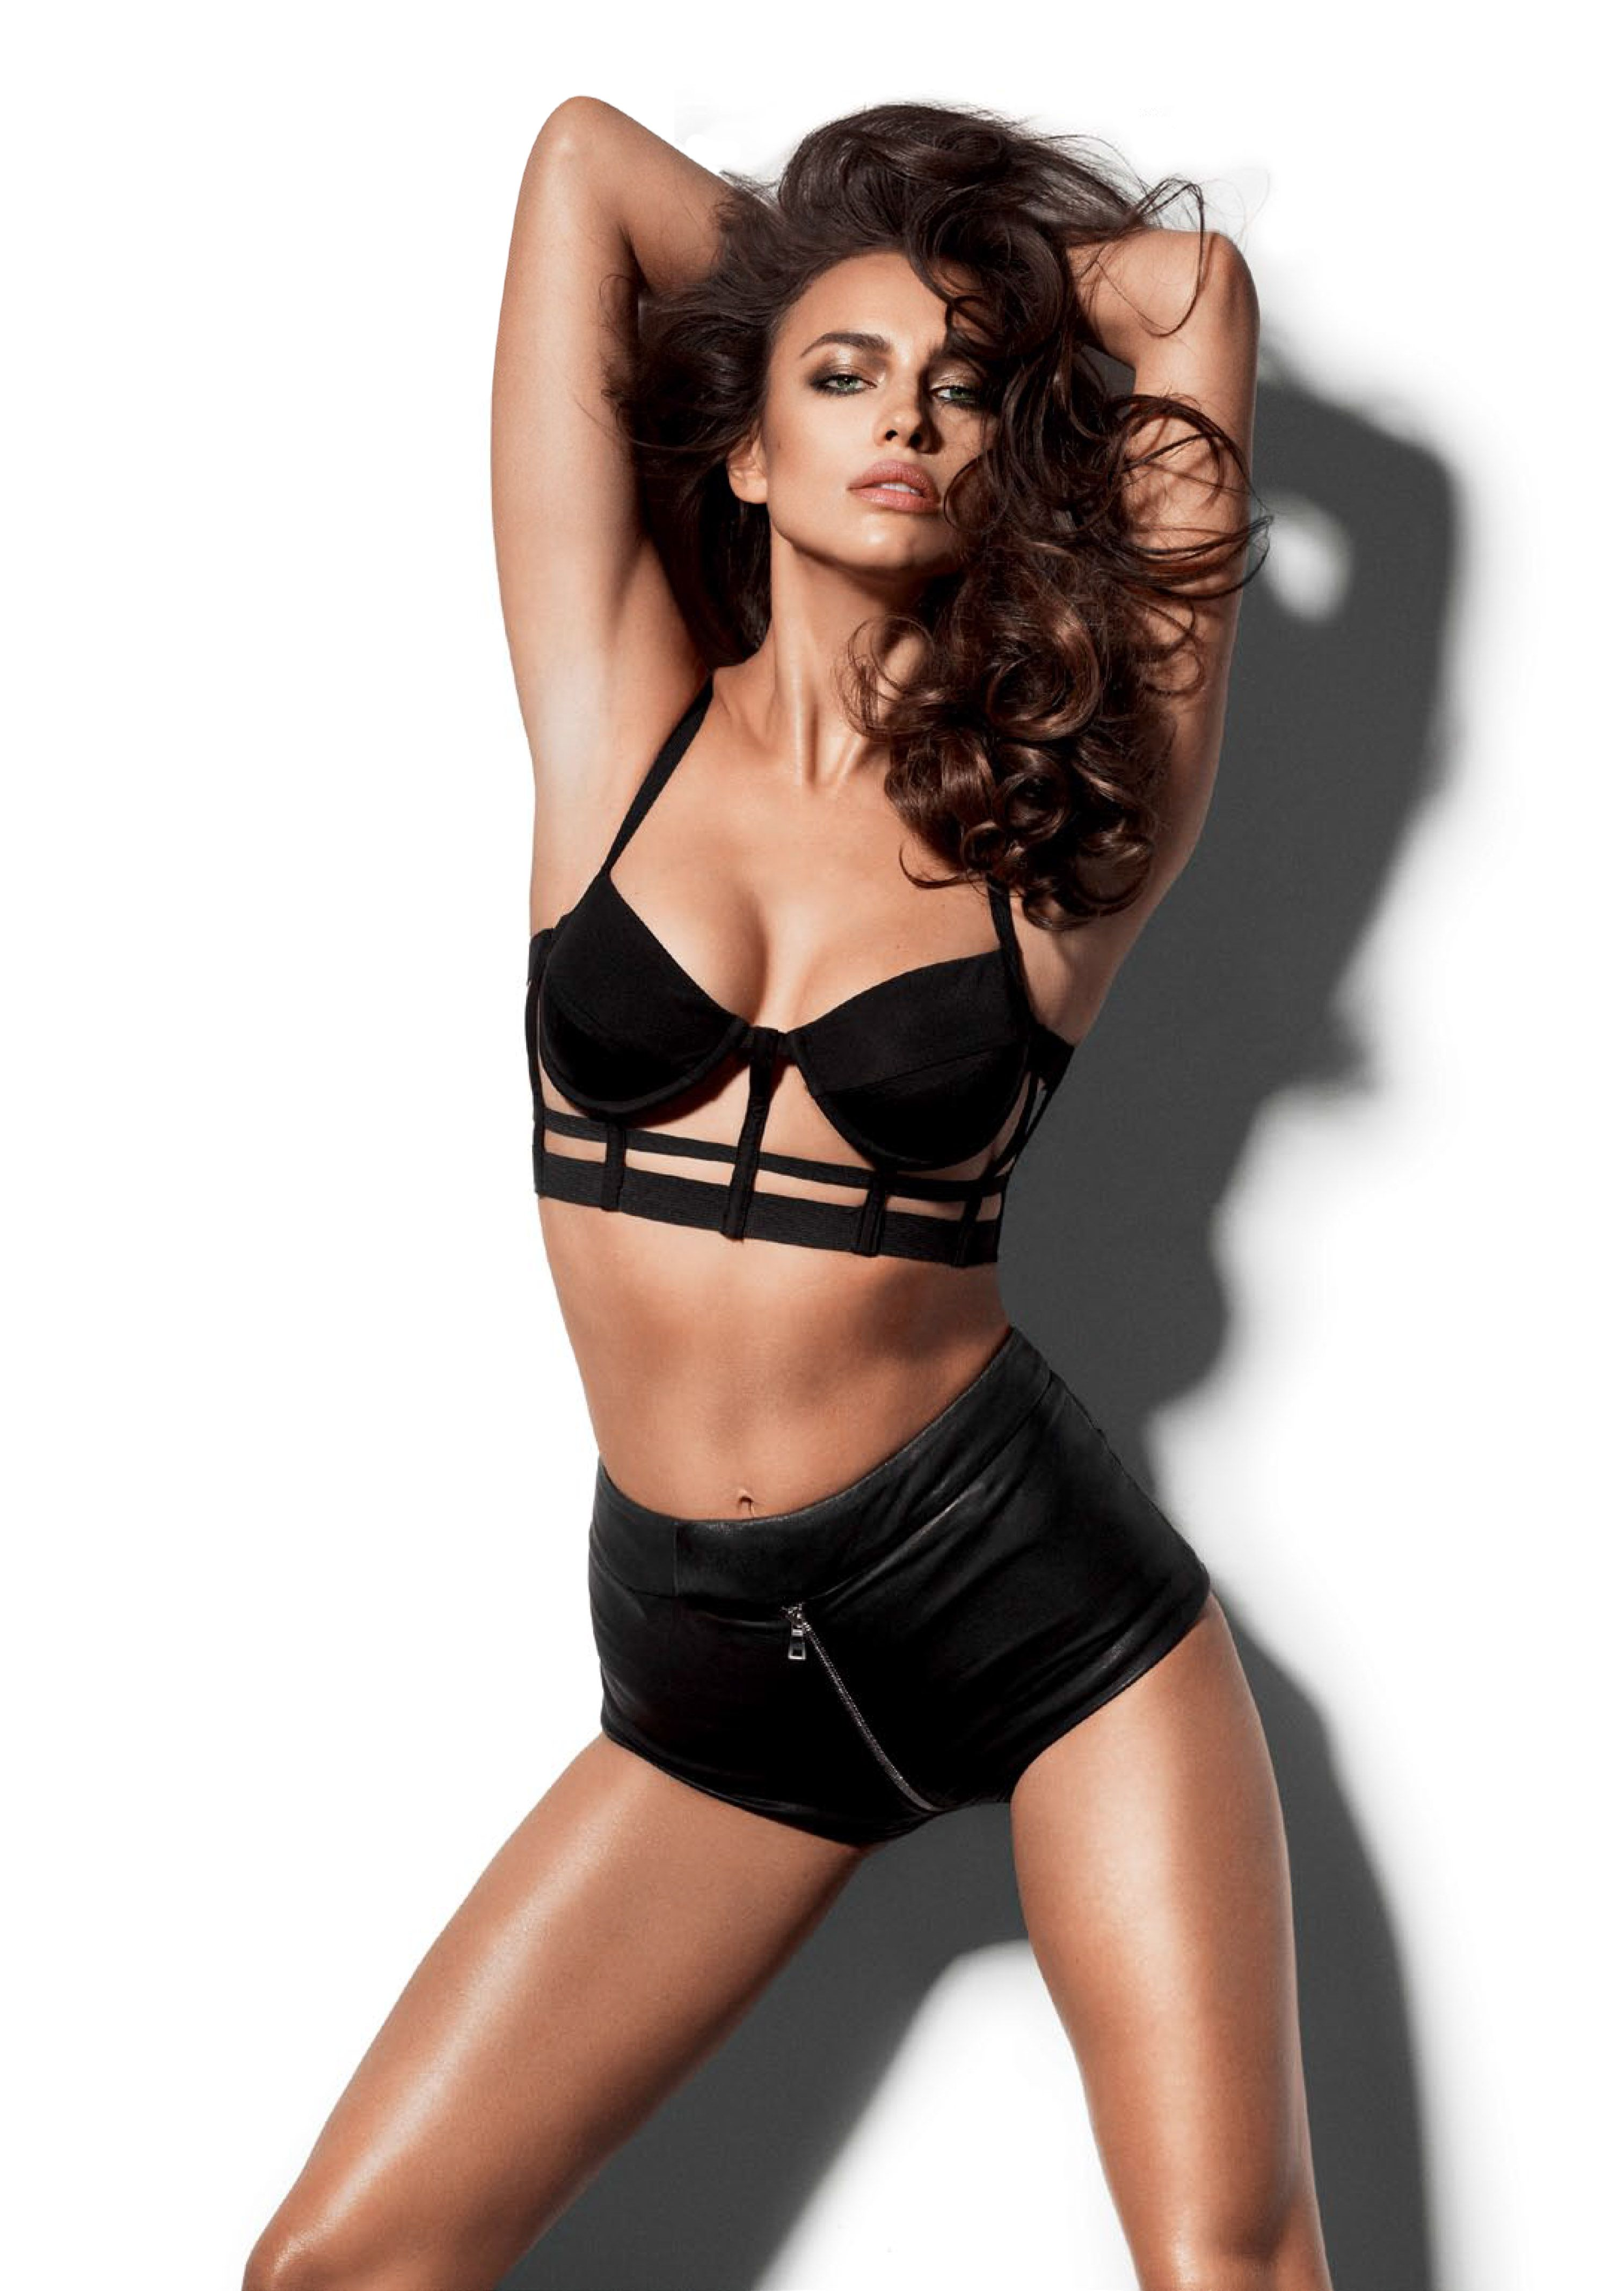 Amber Karis Bassick. 2018-2019 celebrityes photos leaks!,Claudia mason Hot video Kim turnbull bikini,Rachel cook ass